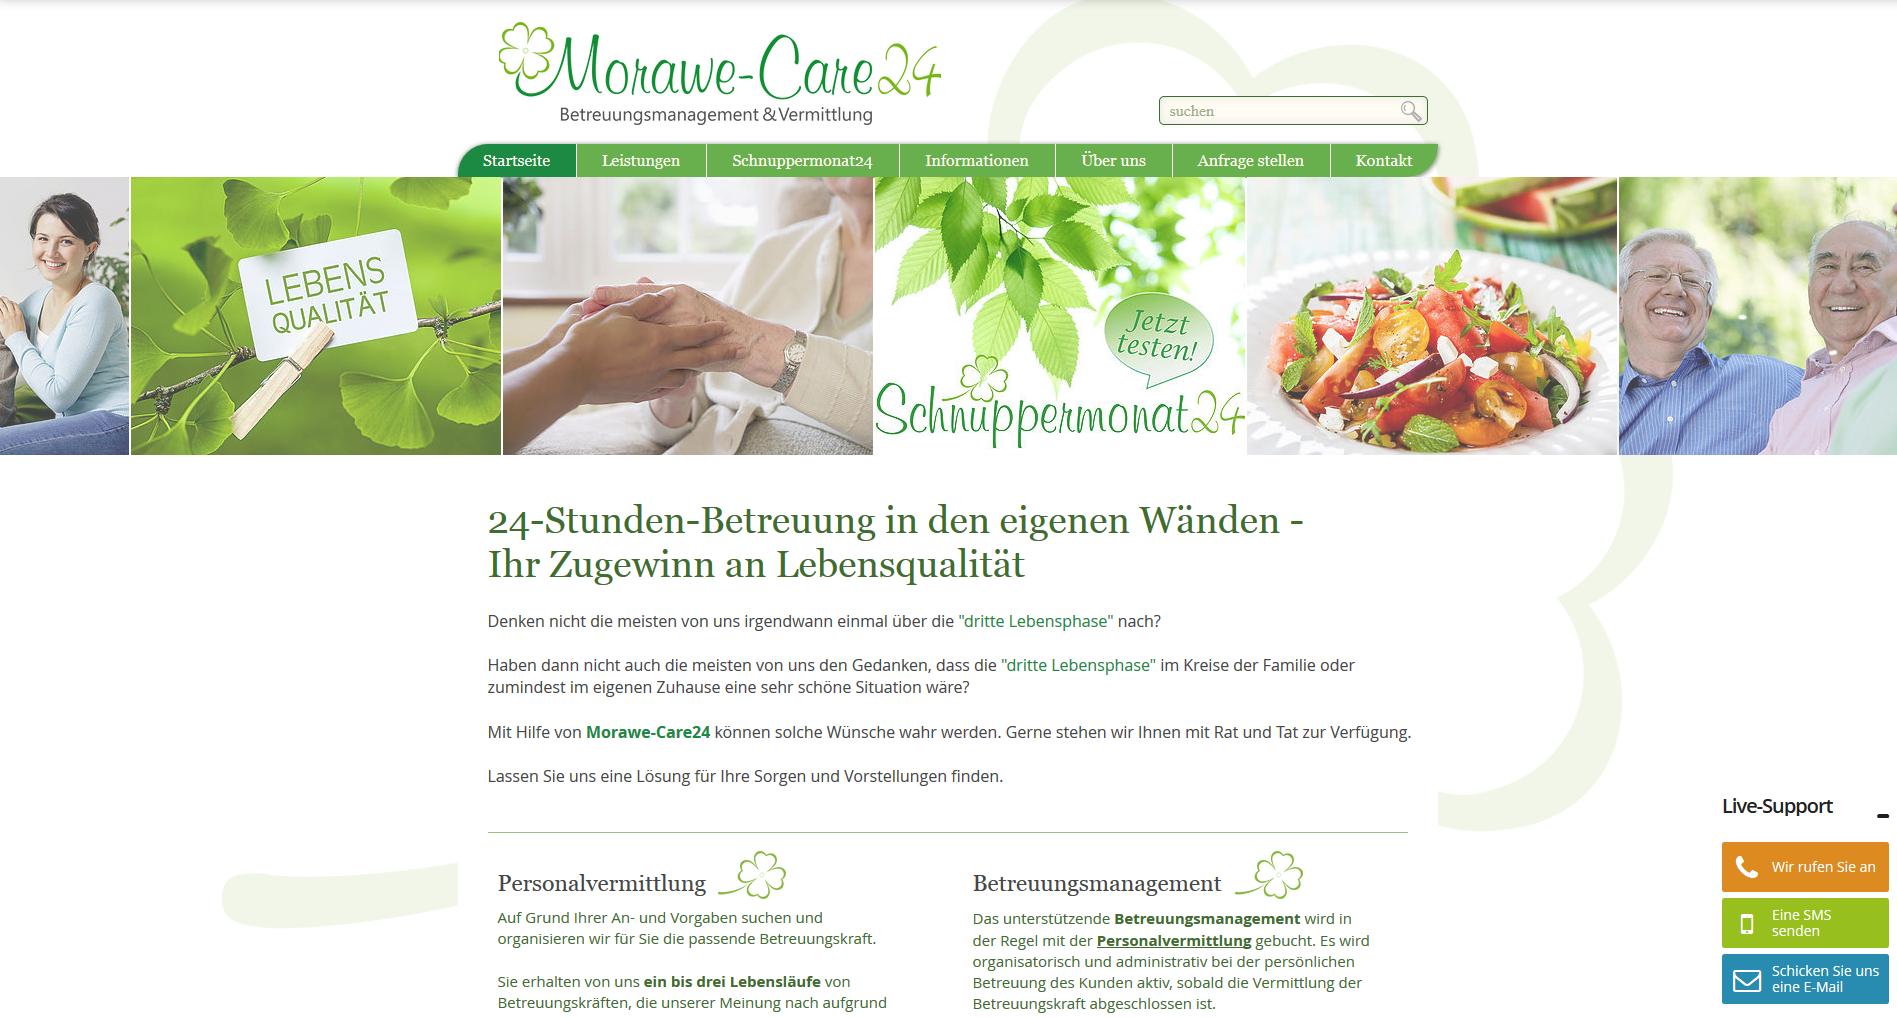 Morawe-Care24